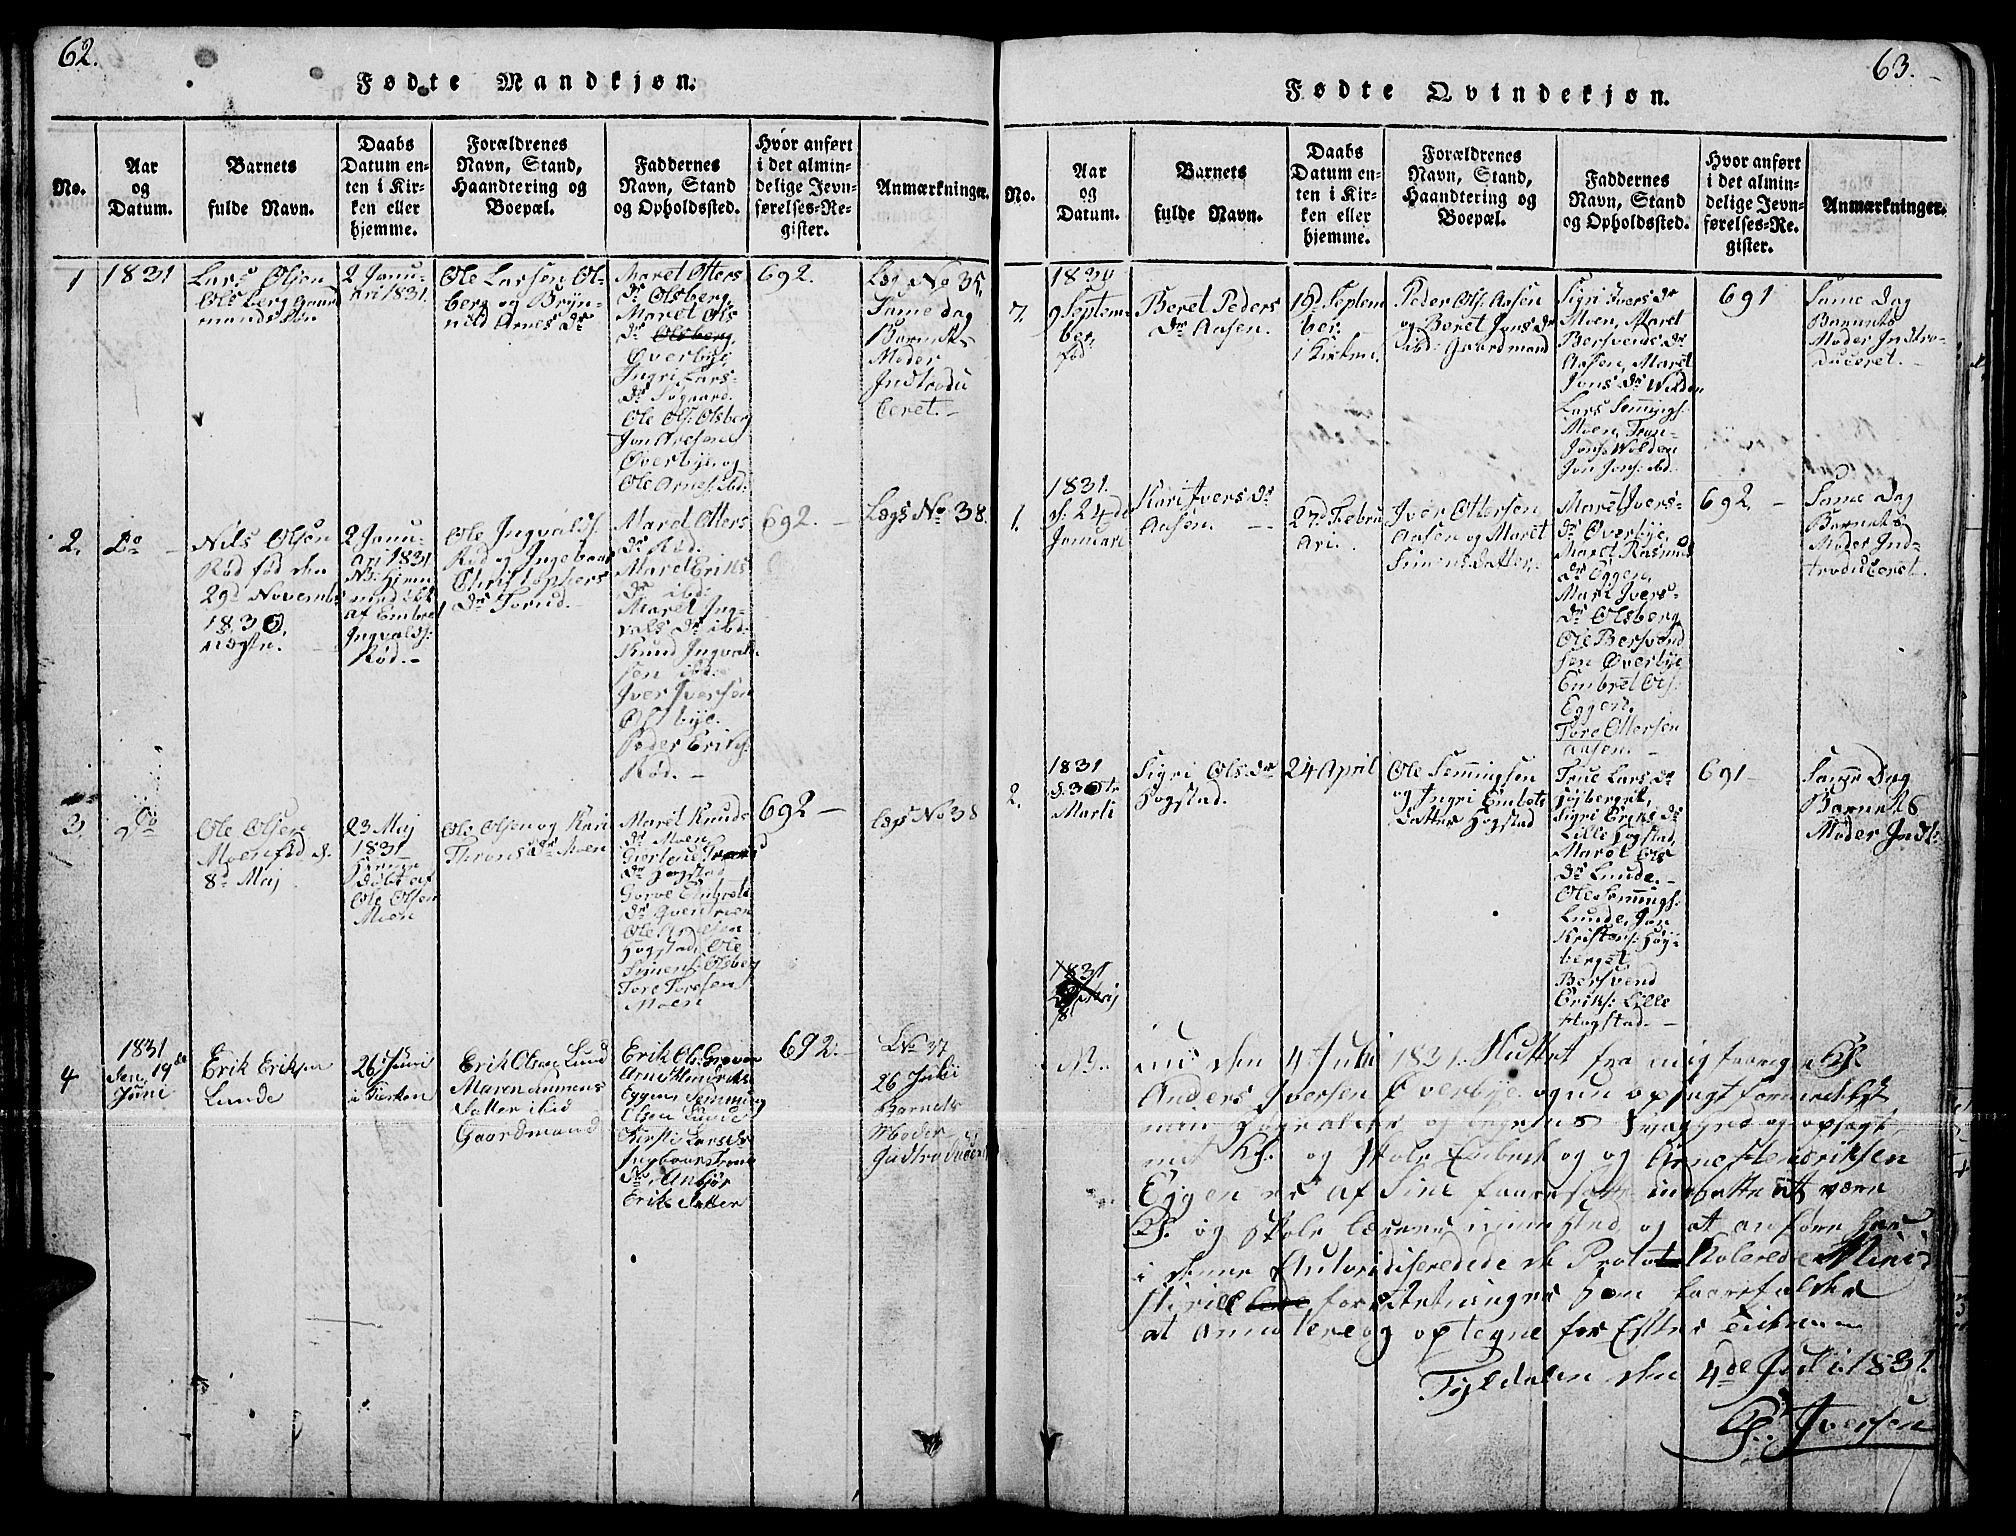 SAH, Tynset prestekontor, Klokkerbok nr. 4, 1814-1879, s. 62-63